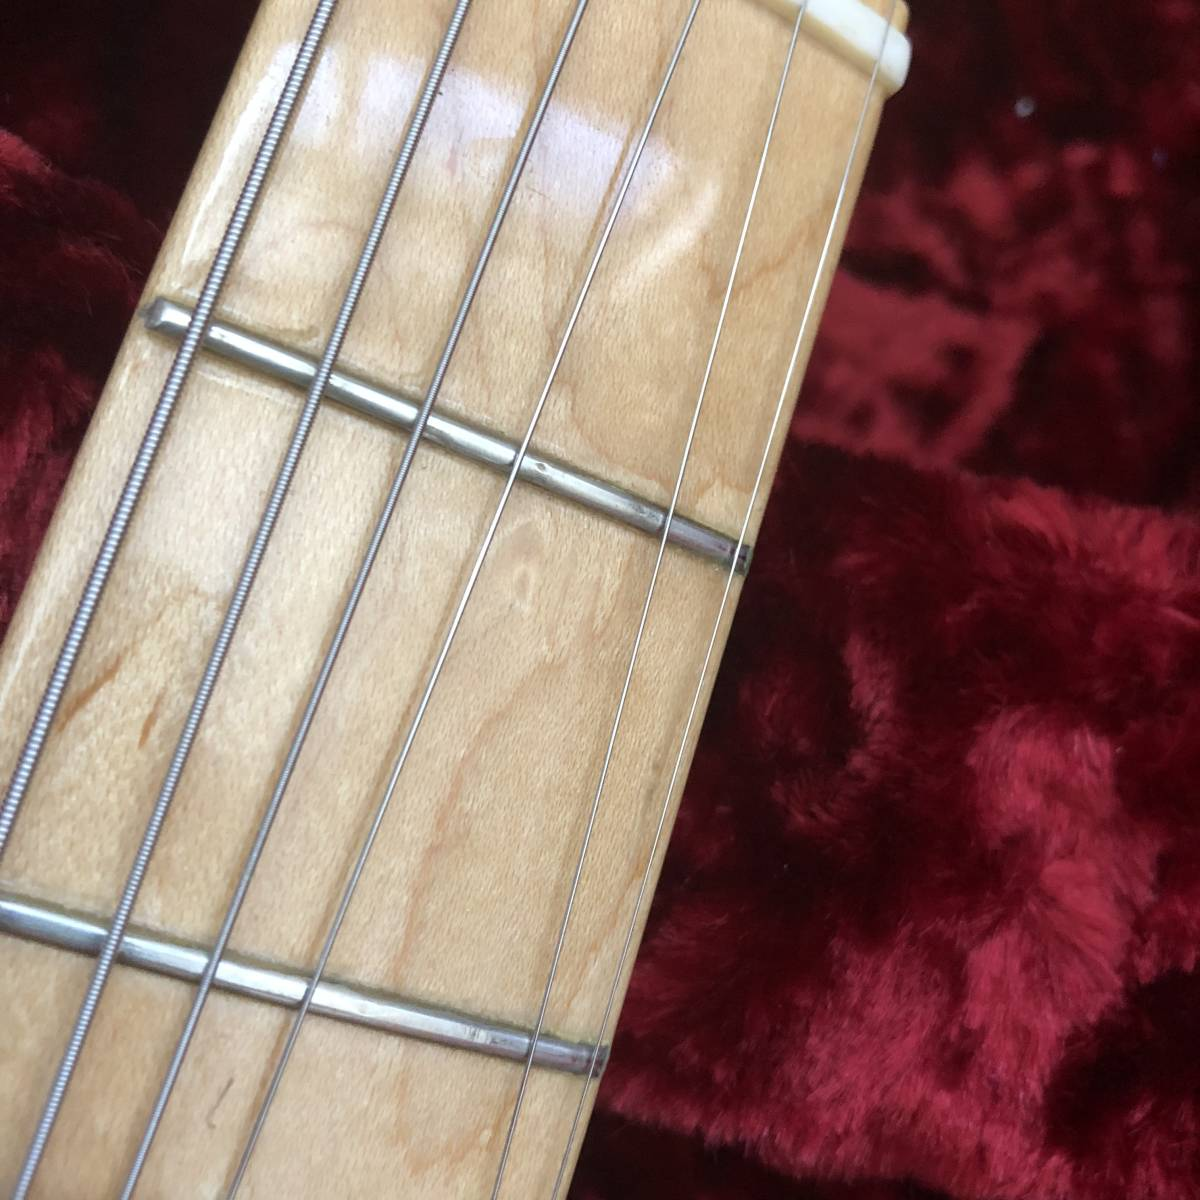 Fender USA 56 American Vintage Stratocaster White Blonde 2013年 Ash クリスマスキャスター風 クラプトン ストラト フェンダー_画像3